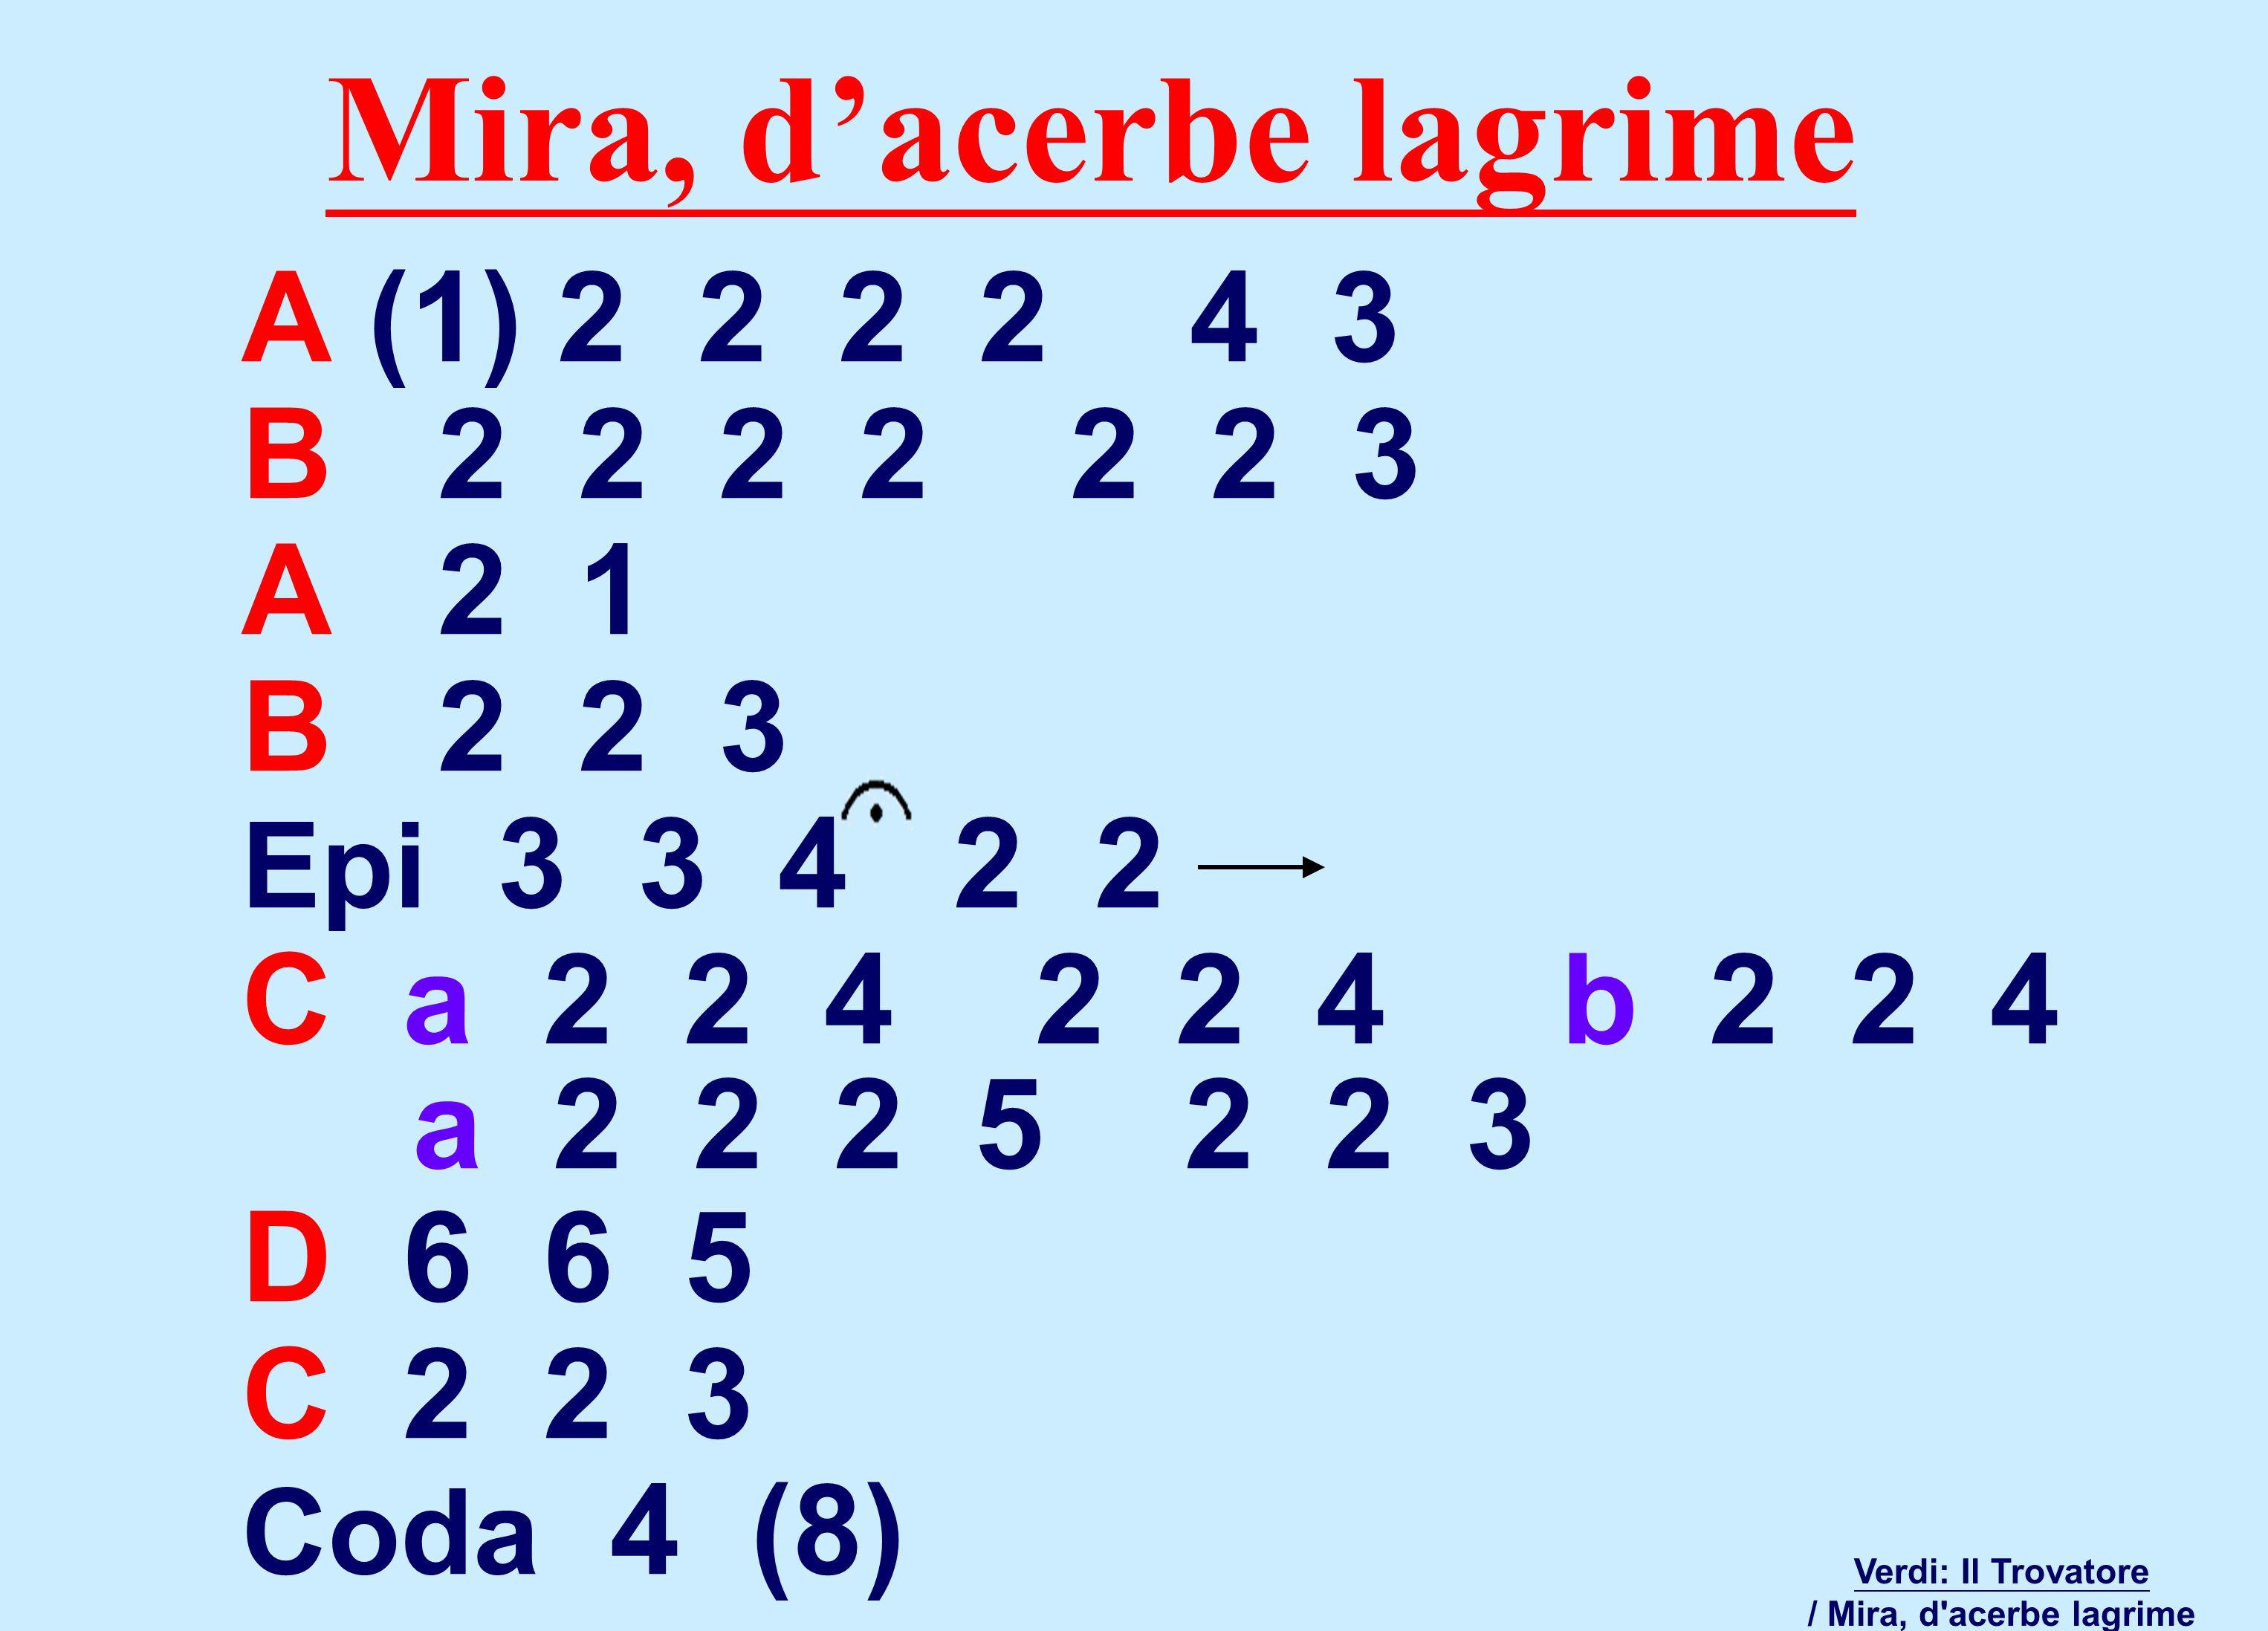 A (1) 2 2 2 2 4 3 B 2 2 2 2 2 2 3 A 2 1 B 2 2 3 Epi 3 3 4 2 2 C a 2 2 4 2 2 4 b 2 2 4 a 2 2 2 5 2 2 3 D 6 6 5 C 2 2 3 Coda 4 (8) Verdi: Il Trovatore / Mira, d acerbe lagrime Mira, d'acerbe lagrime